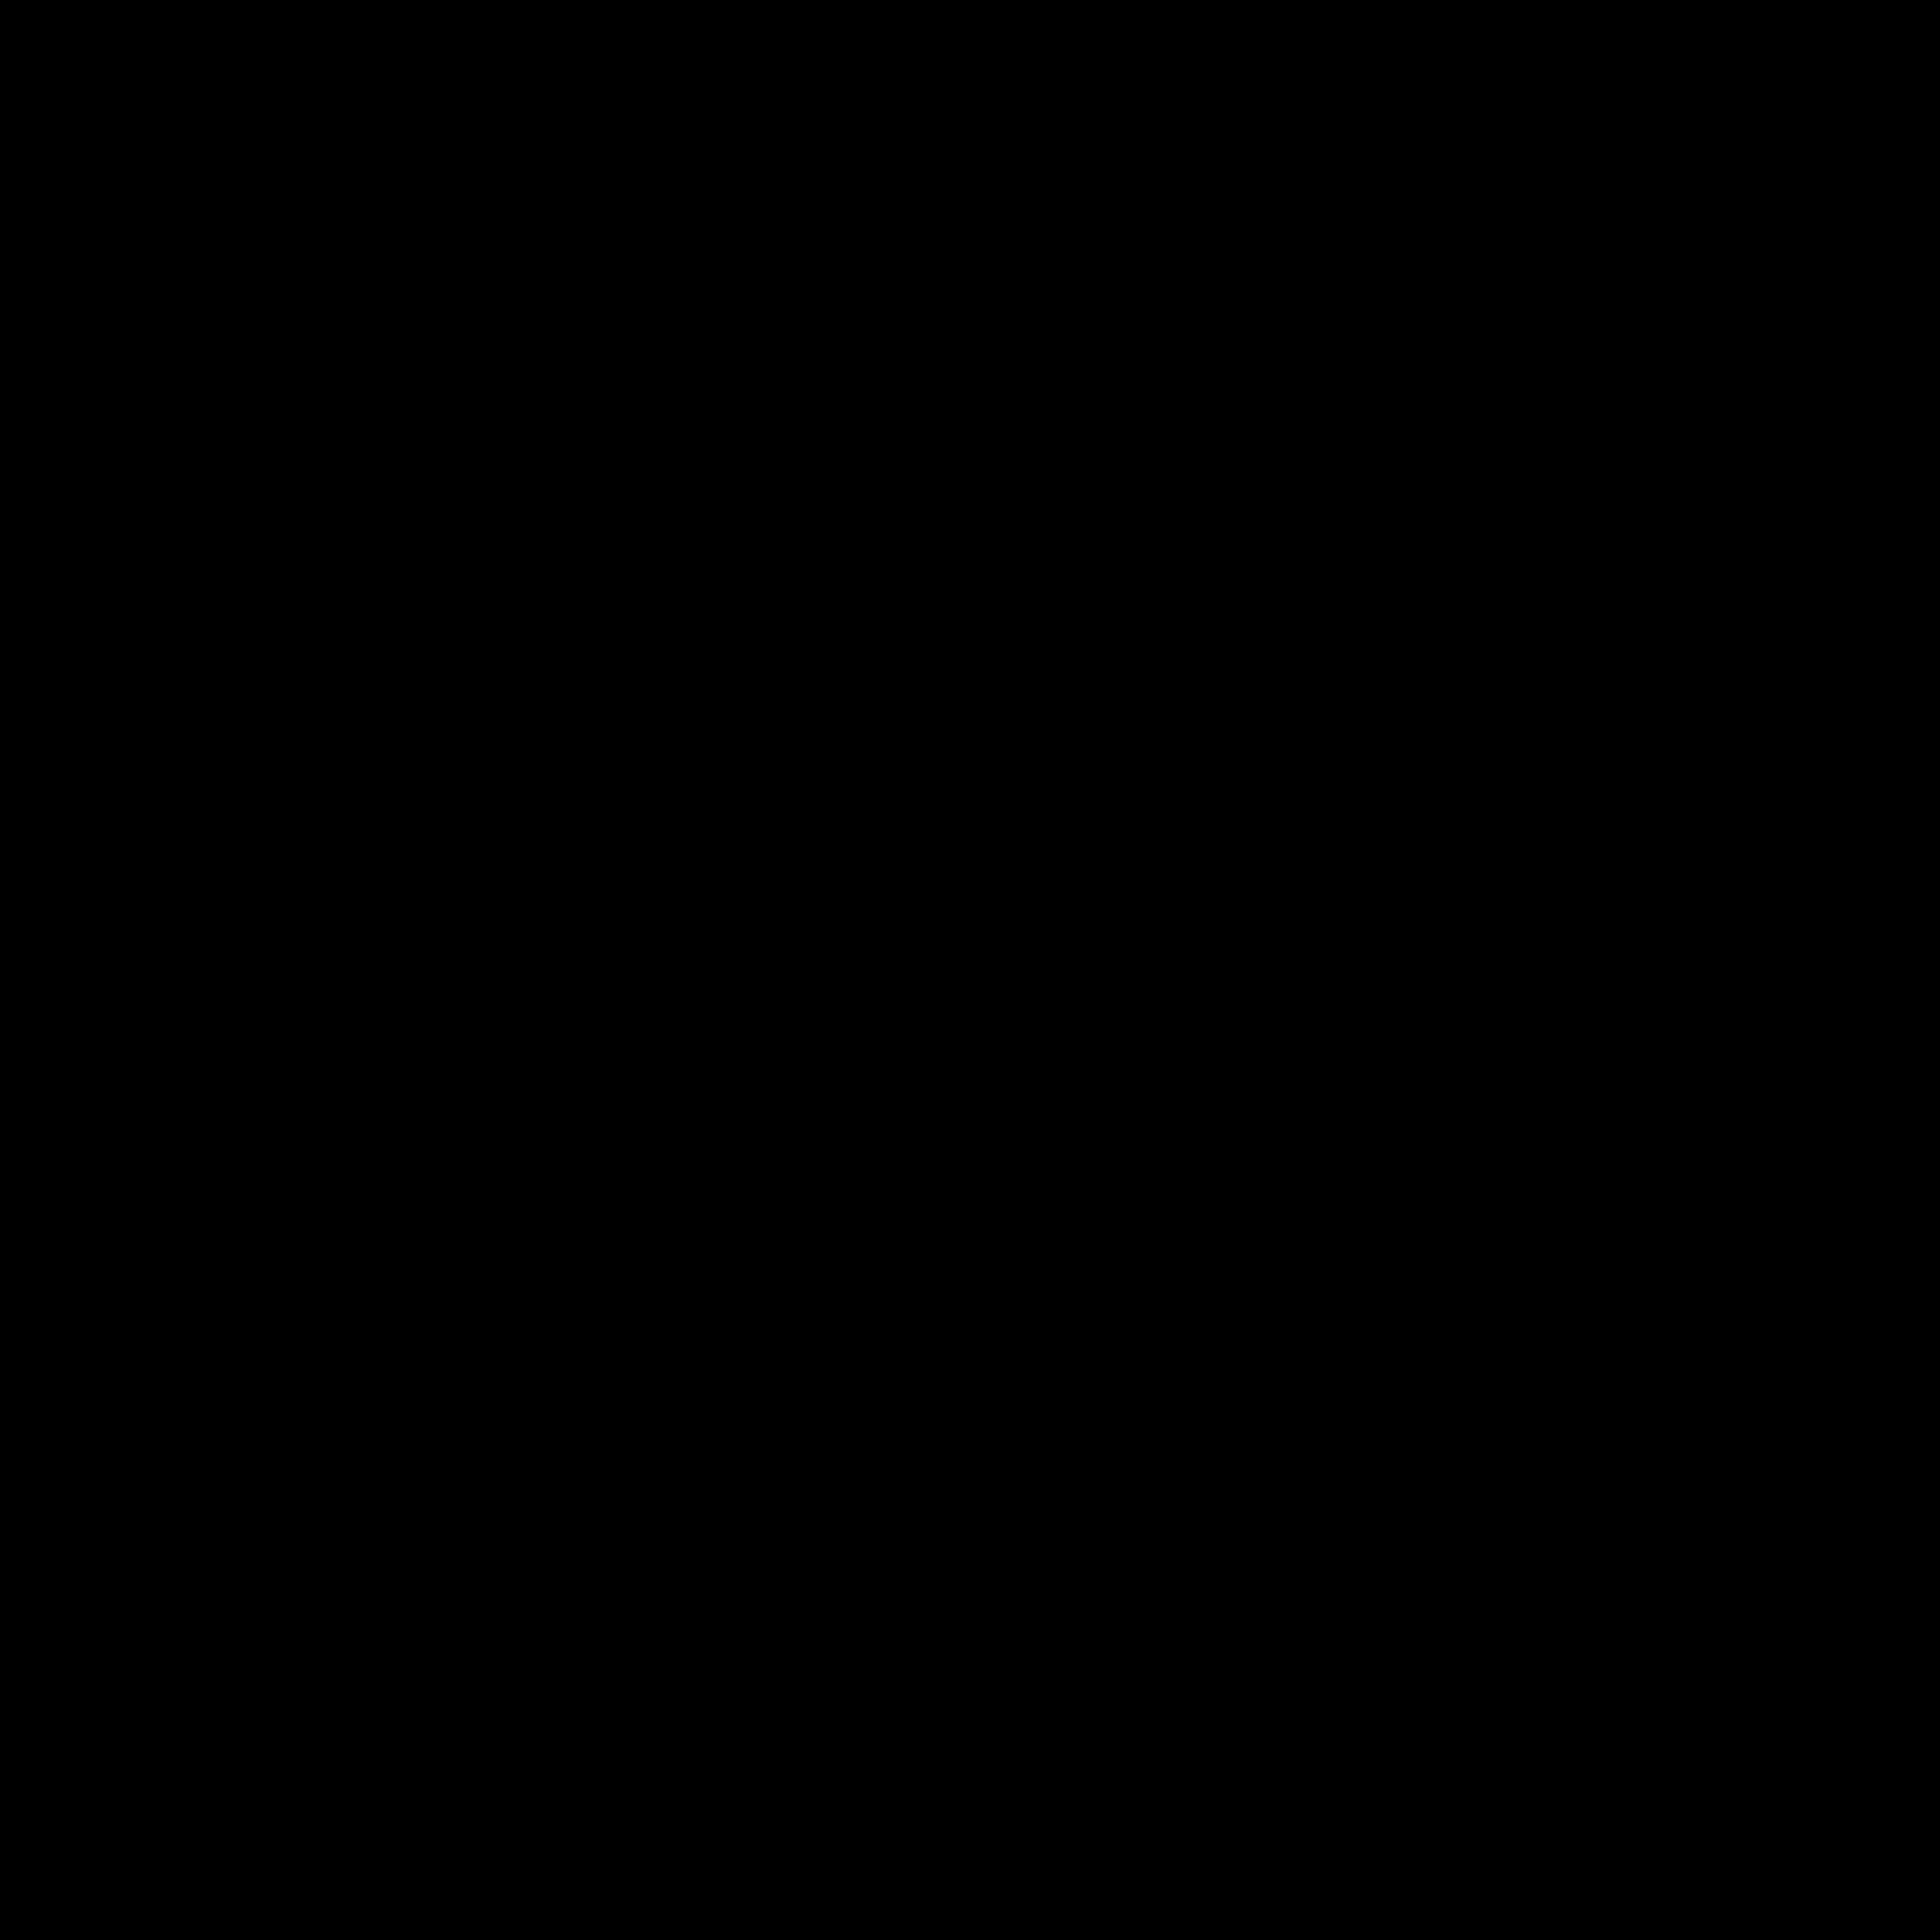 Clipart - Octagonal frame